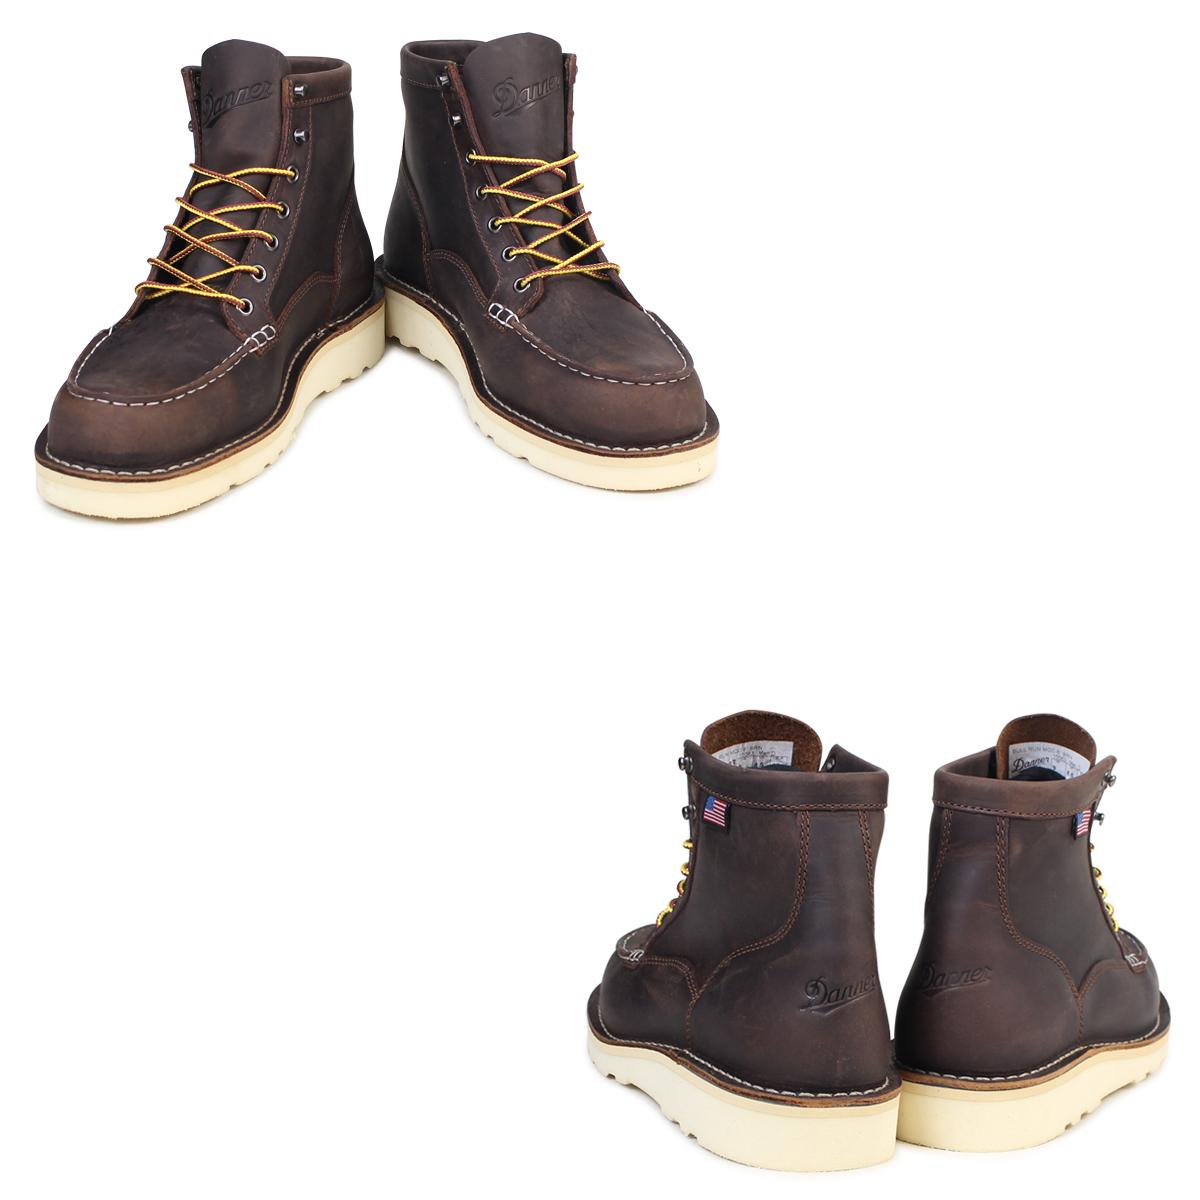 f7e41605c07 Danner boots Danner BULL RUN MOC TOE 6INCH 15563 D Wise men brown